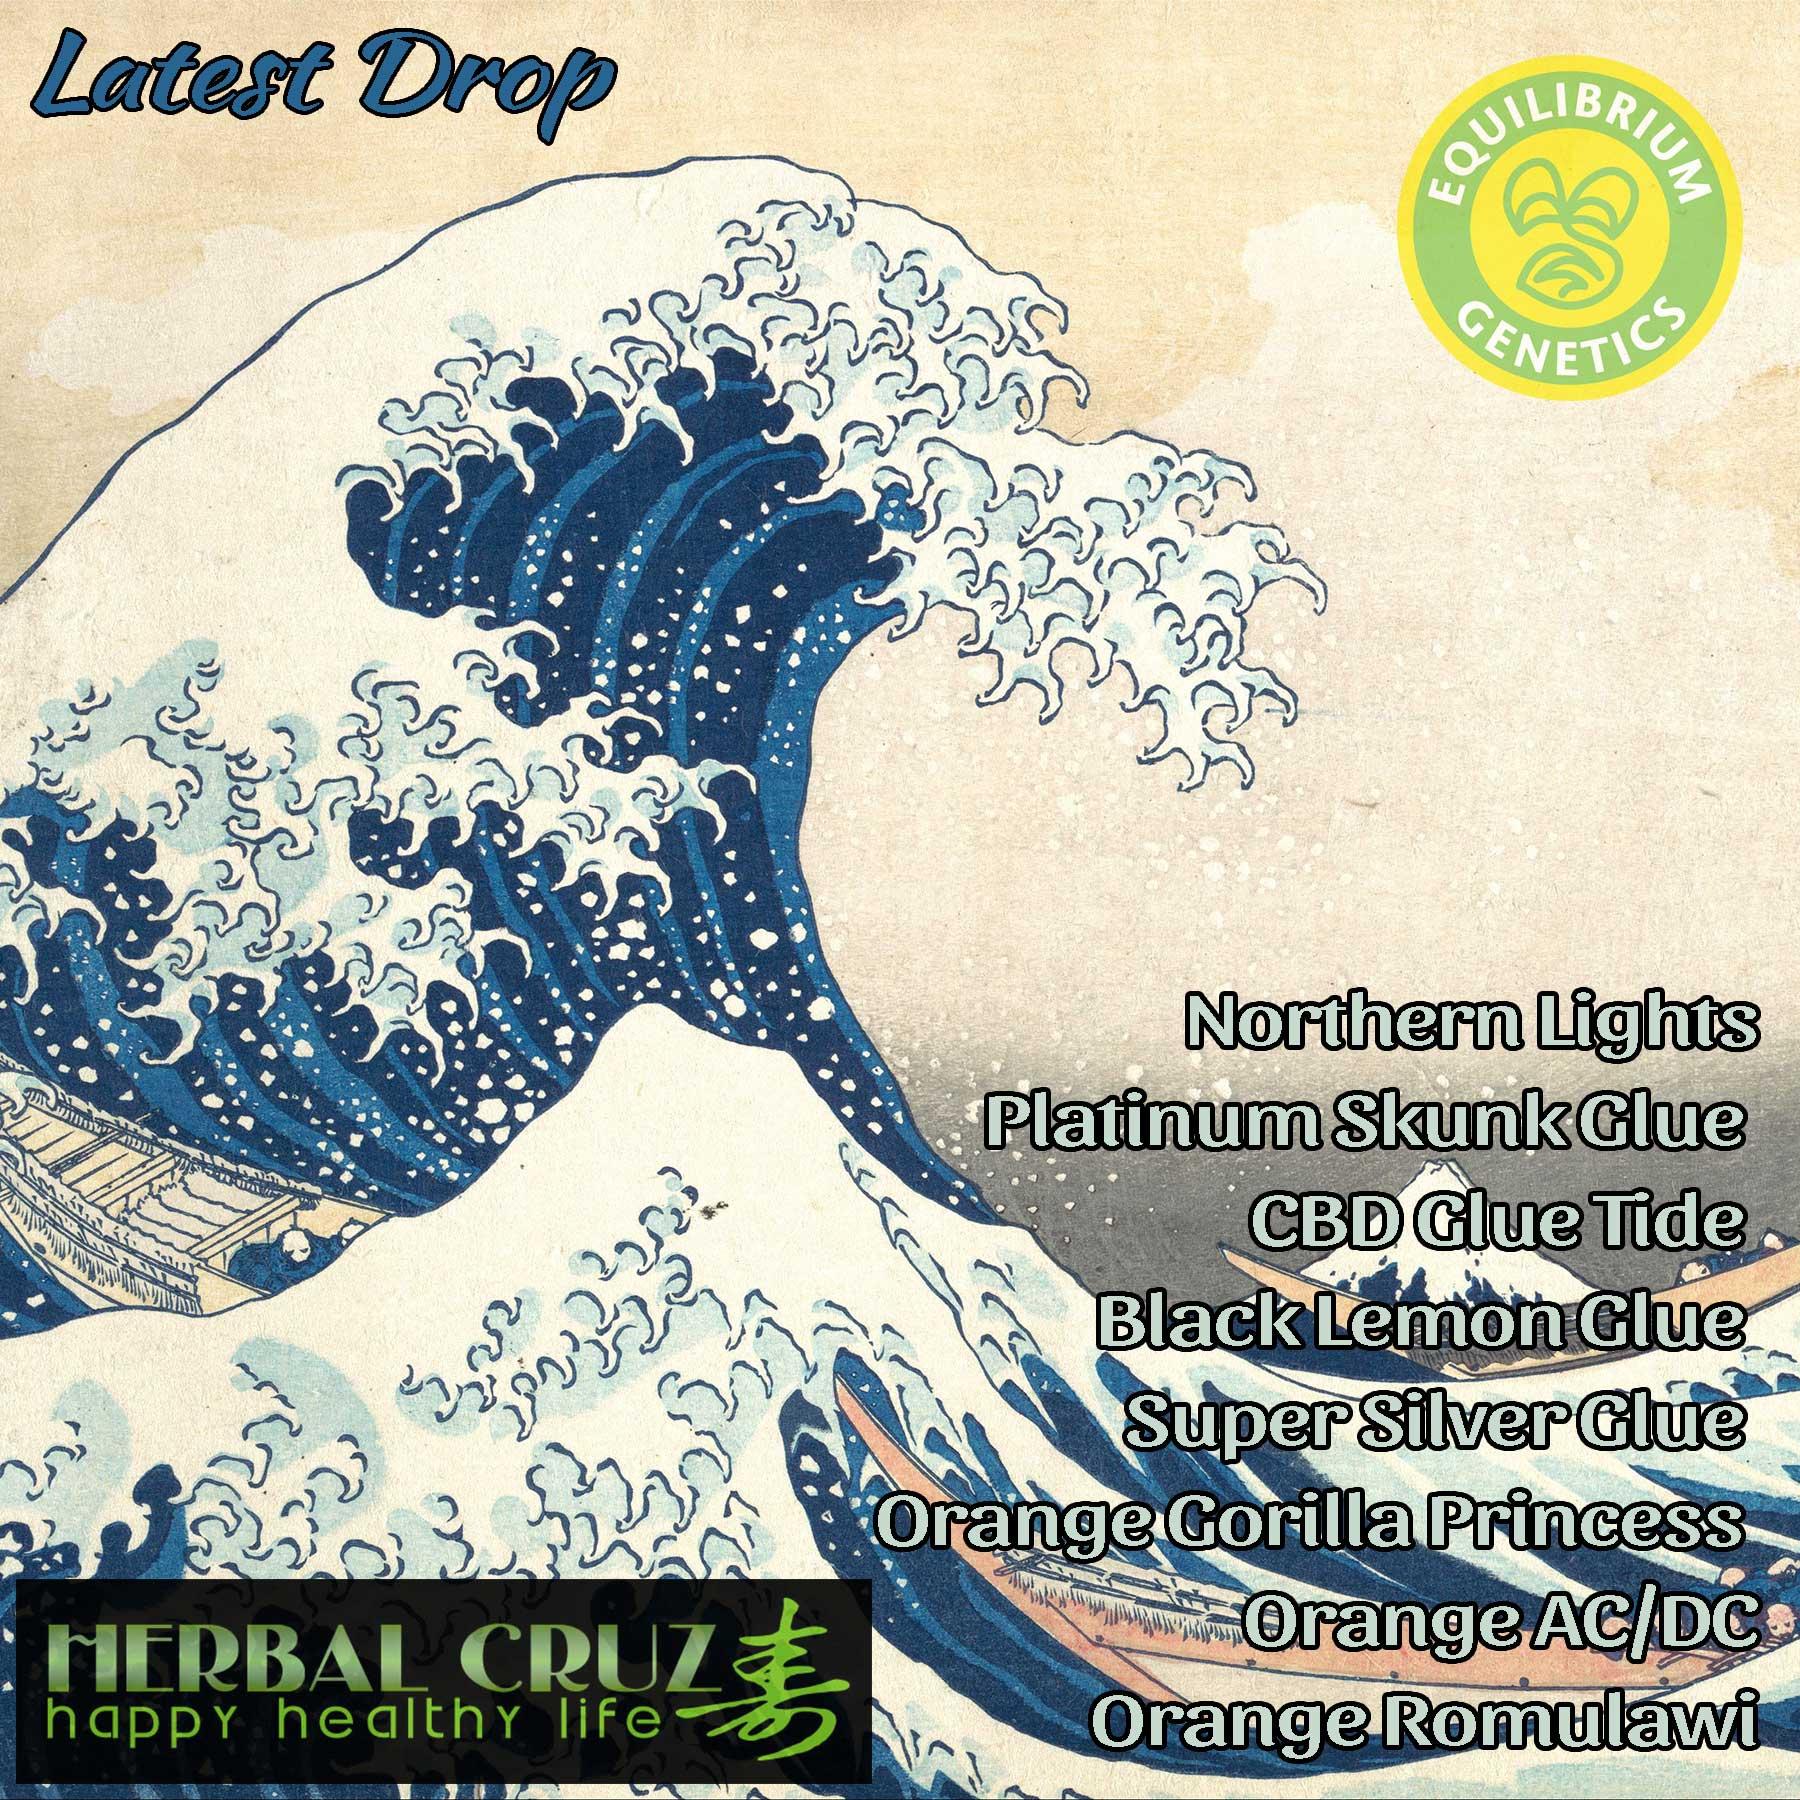 Latest Drop: Herbal Cruz